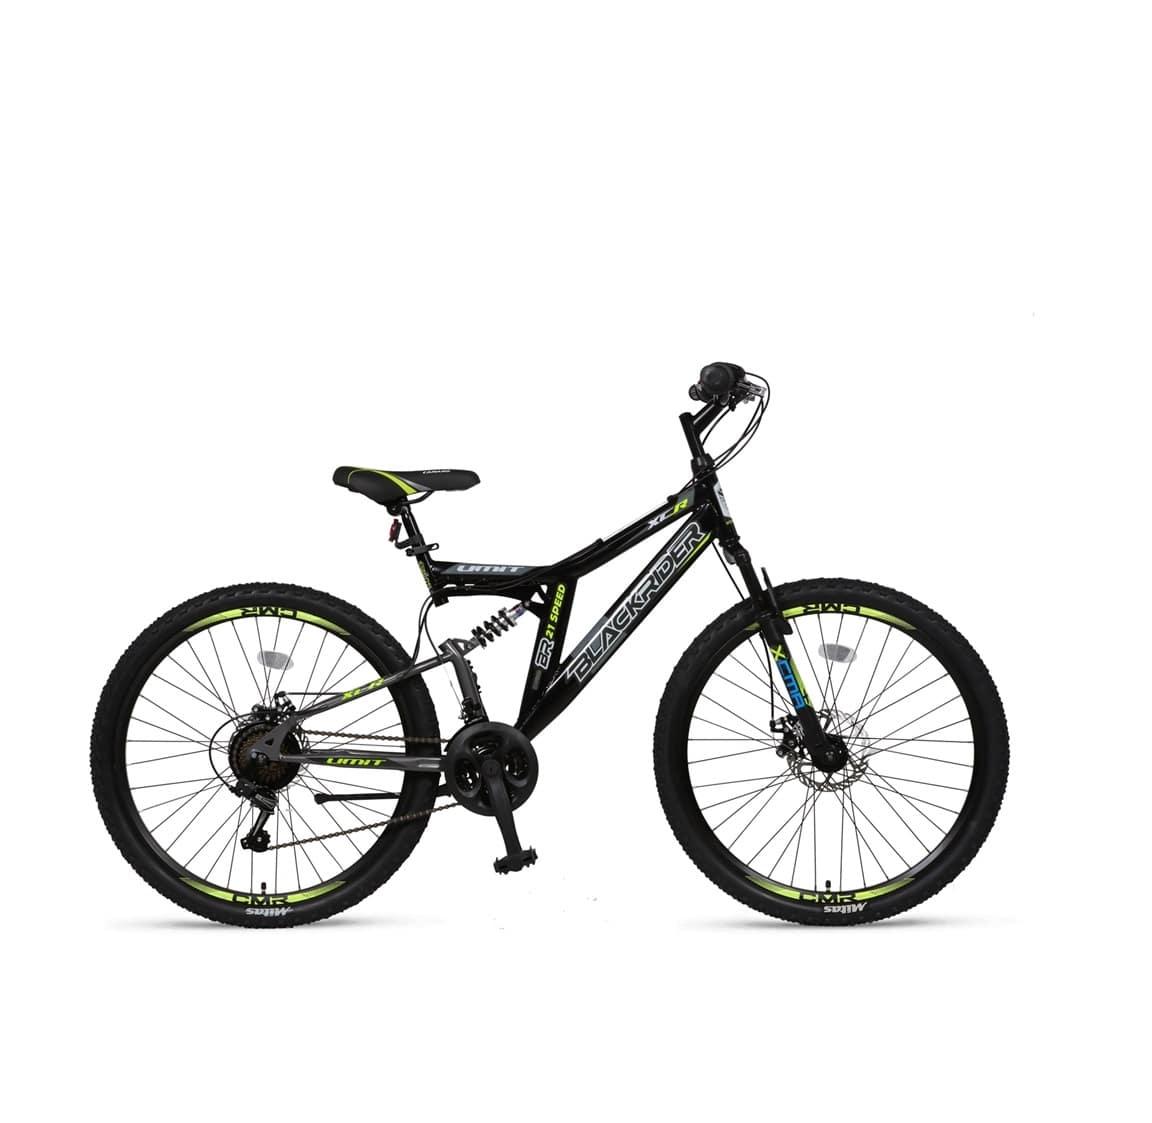 Umit-Black-Rider-26inch-MTB-Grey-Black-Lime-min